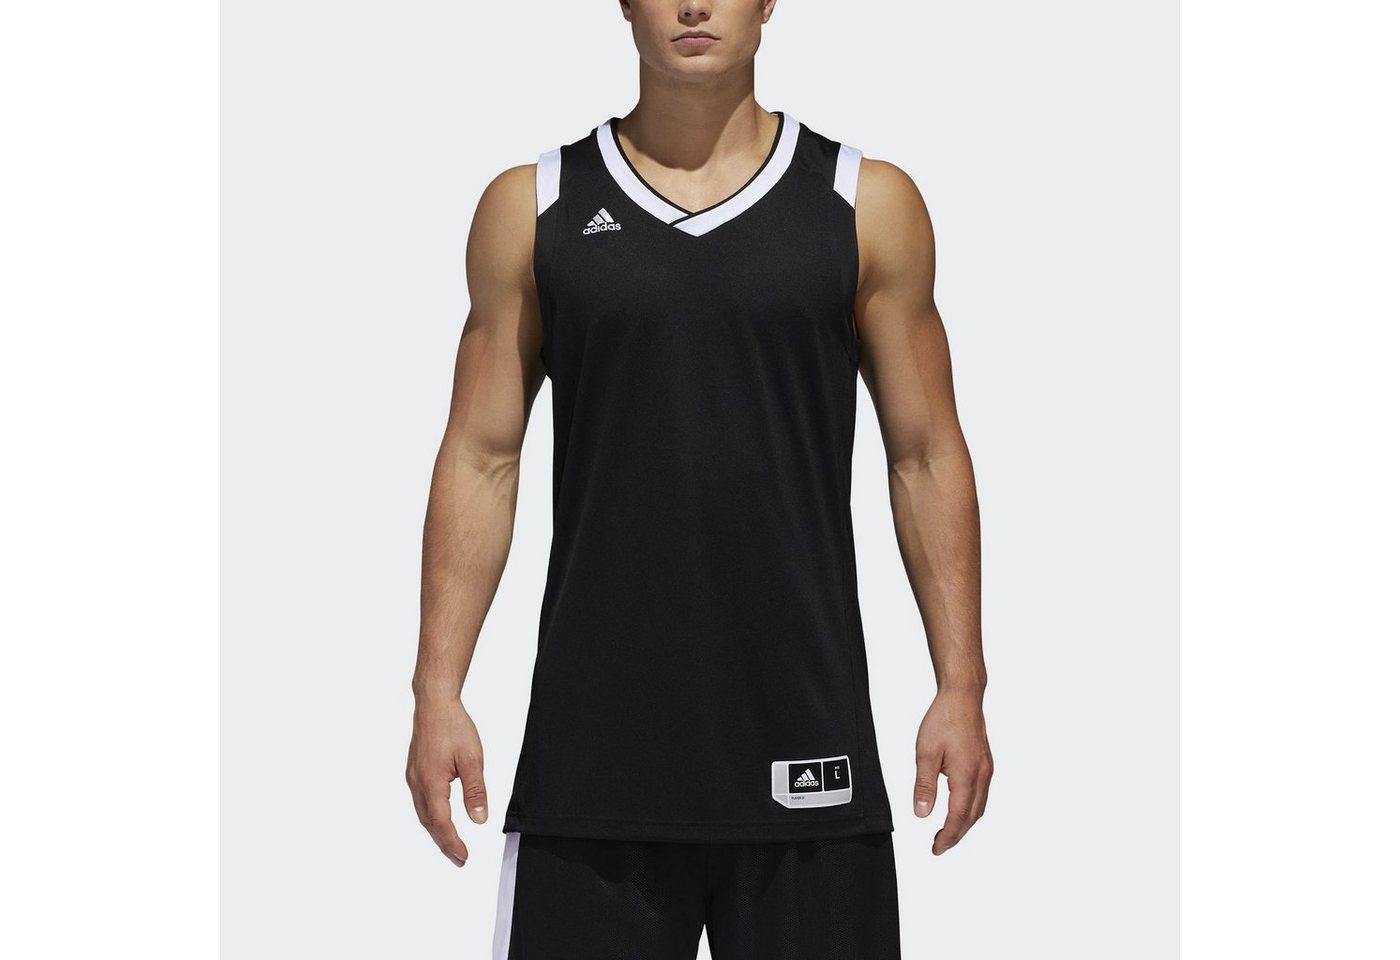 adidas Performance Basketballtrikot »Crazy Explosive Trikot« | Sportbekleidung > Trikots > Basketballtrikots | Schwarz | adidas Performance